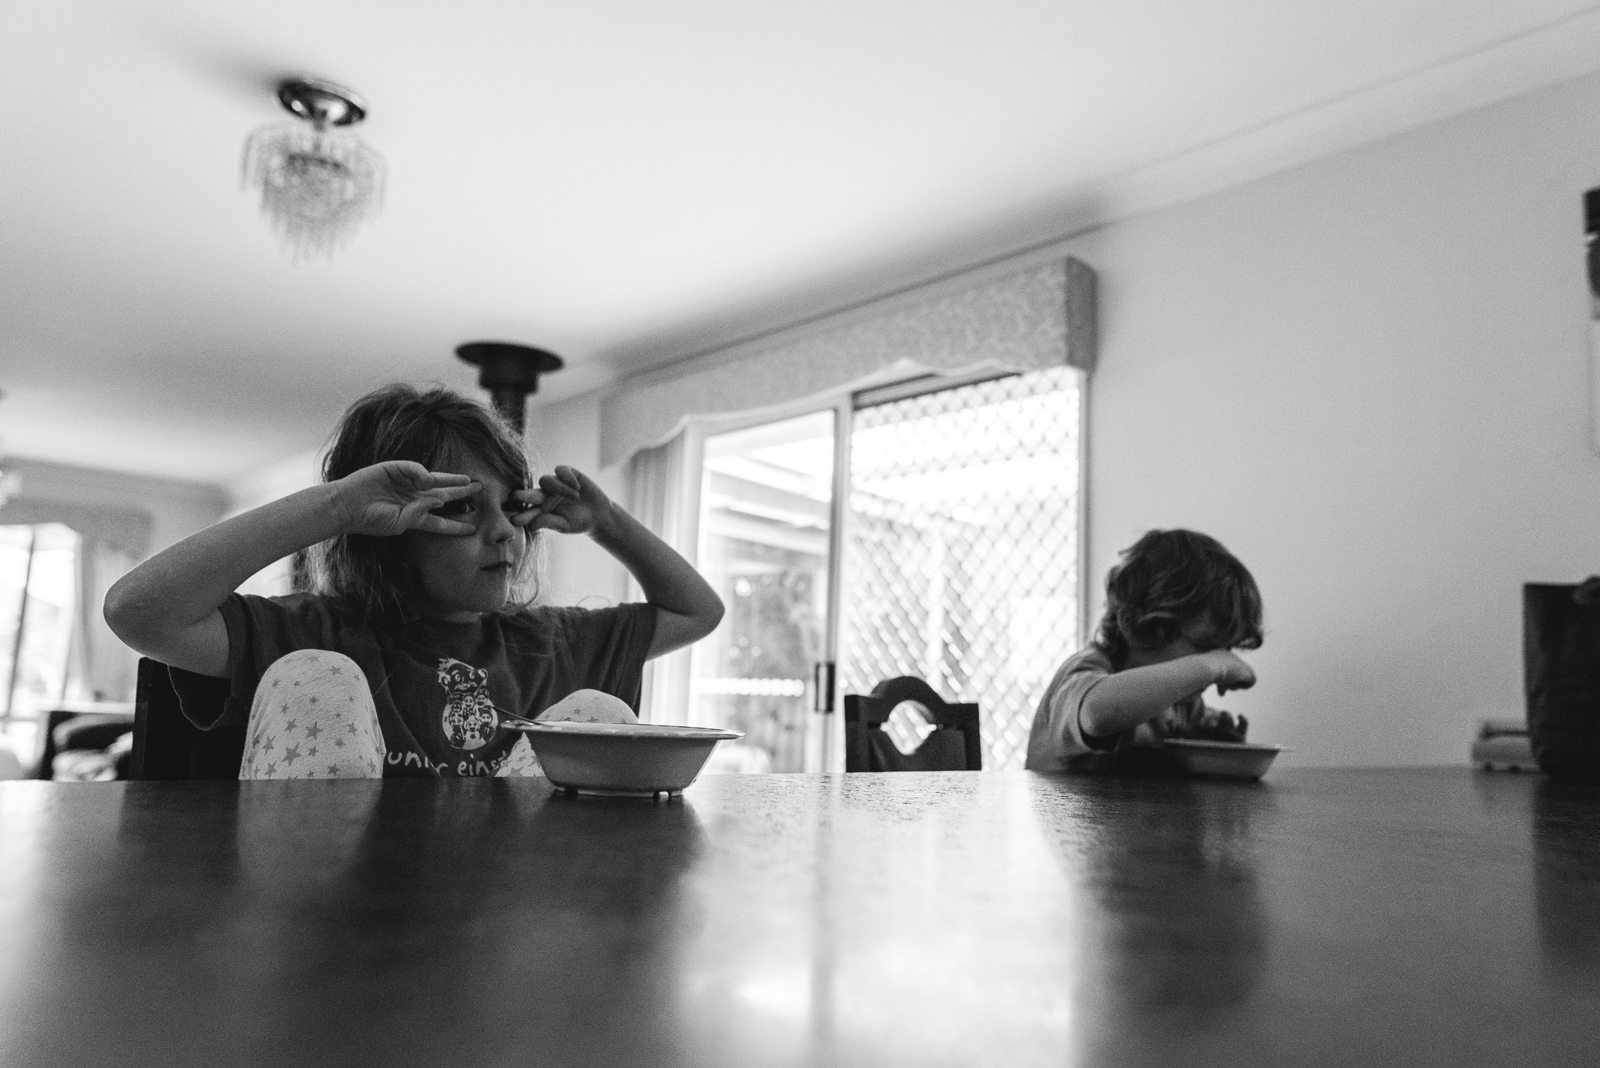 family.photography.wollongong.illawarra (66 of 76).jpg